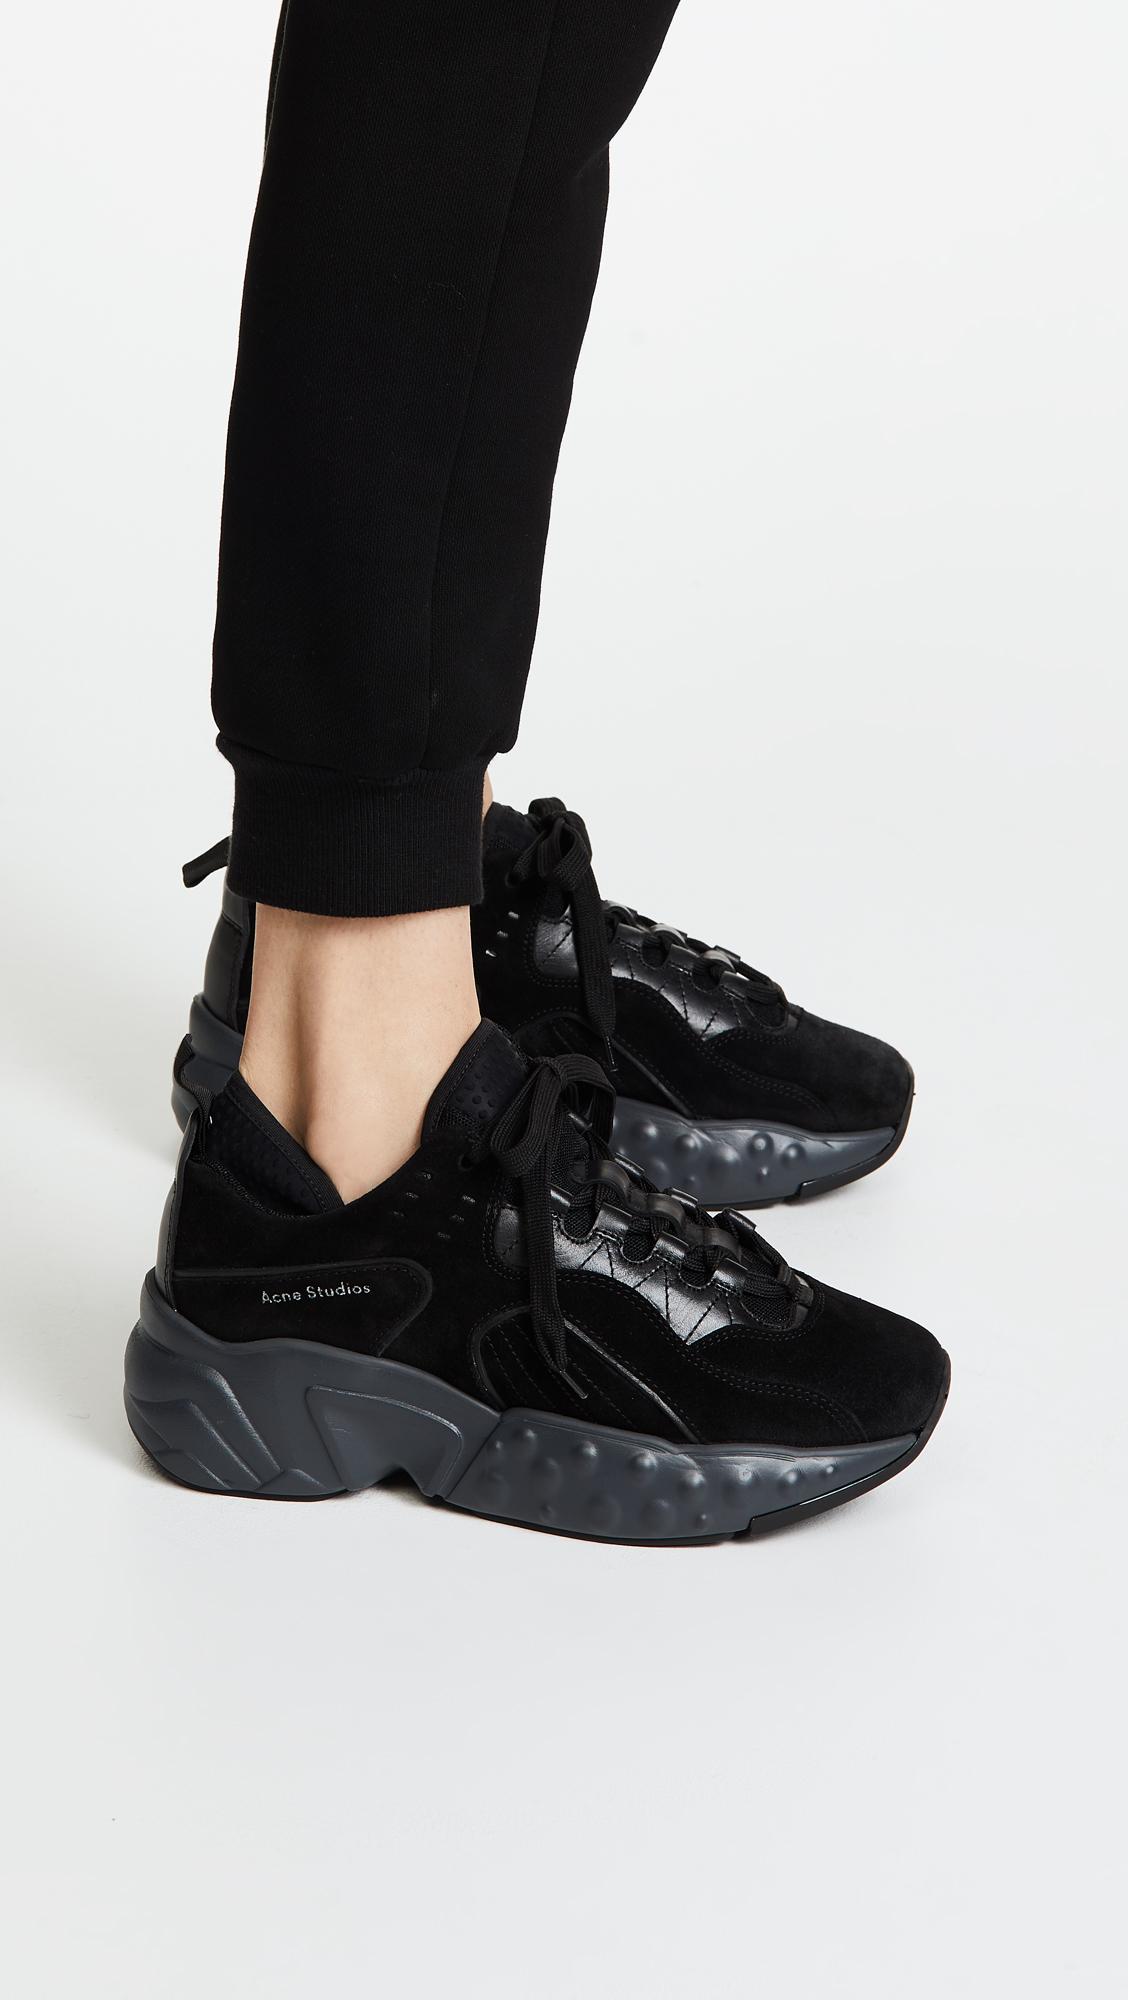 9ad6d7b395b2 Acne Studios Manhattan Sneakers